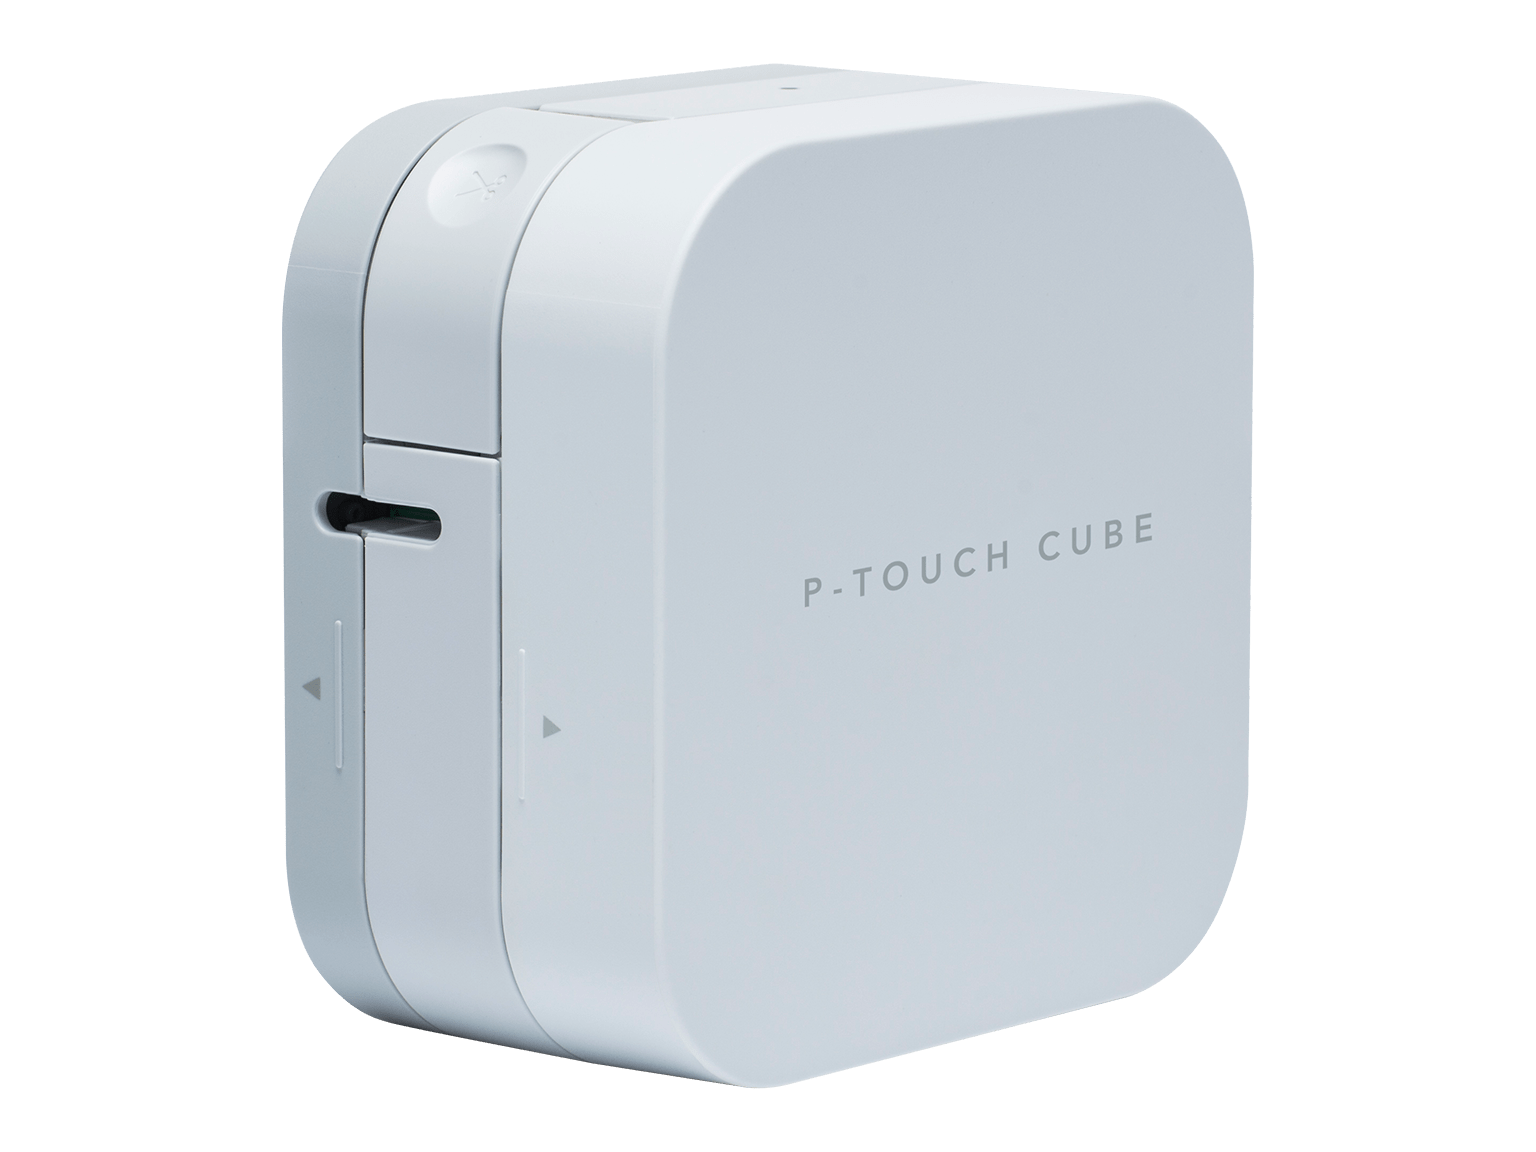 Brother P-touch CUBE P300BT pisač naljepnica